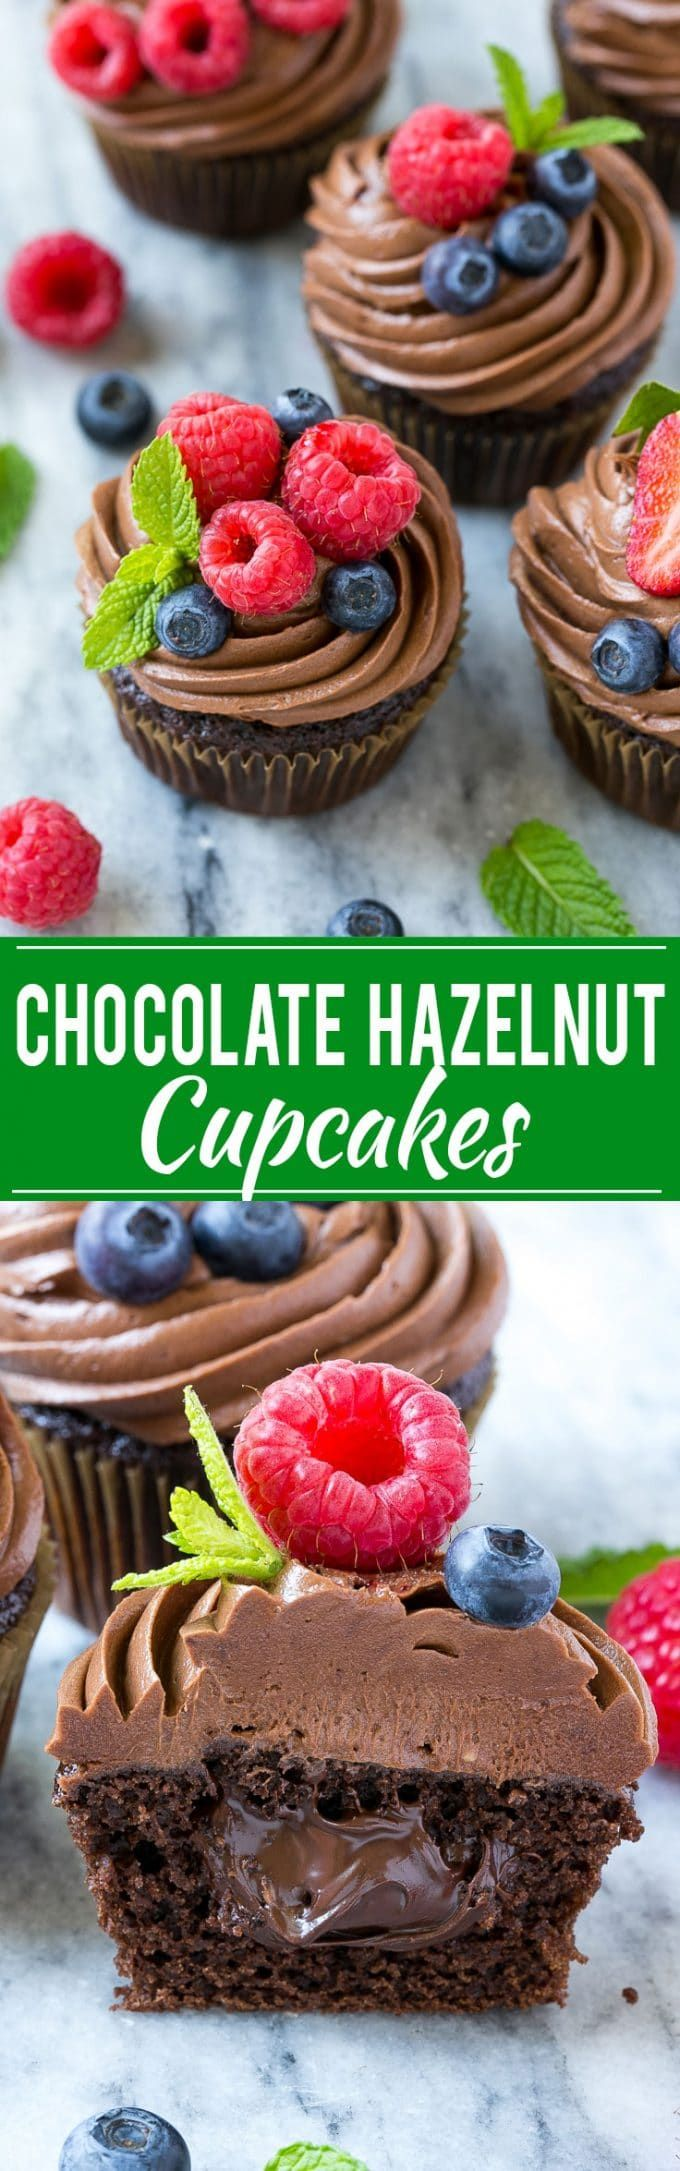 Chocolate Hazelnut Cupcake Recipe | Best Chocolate Cupcake Recipe . Sin añadir agua!!!!